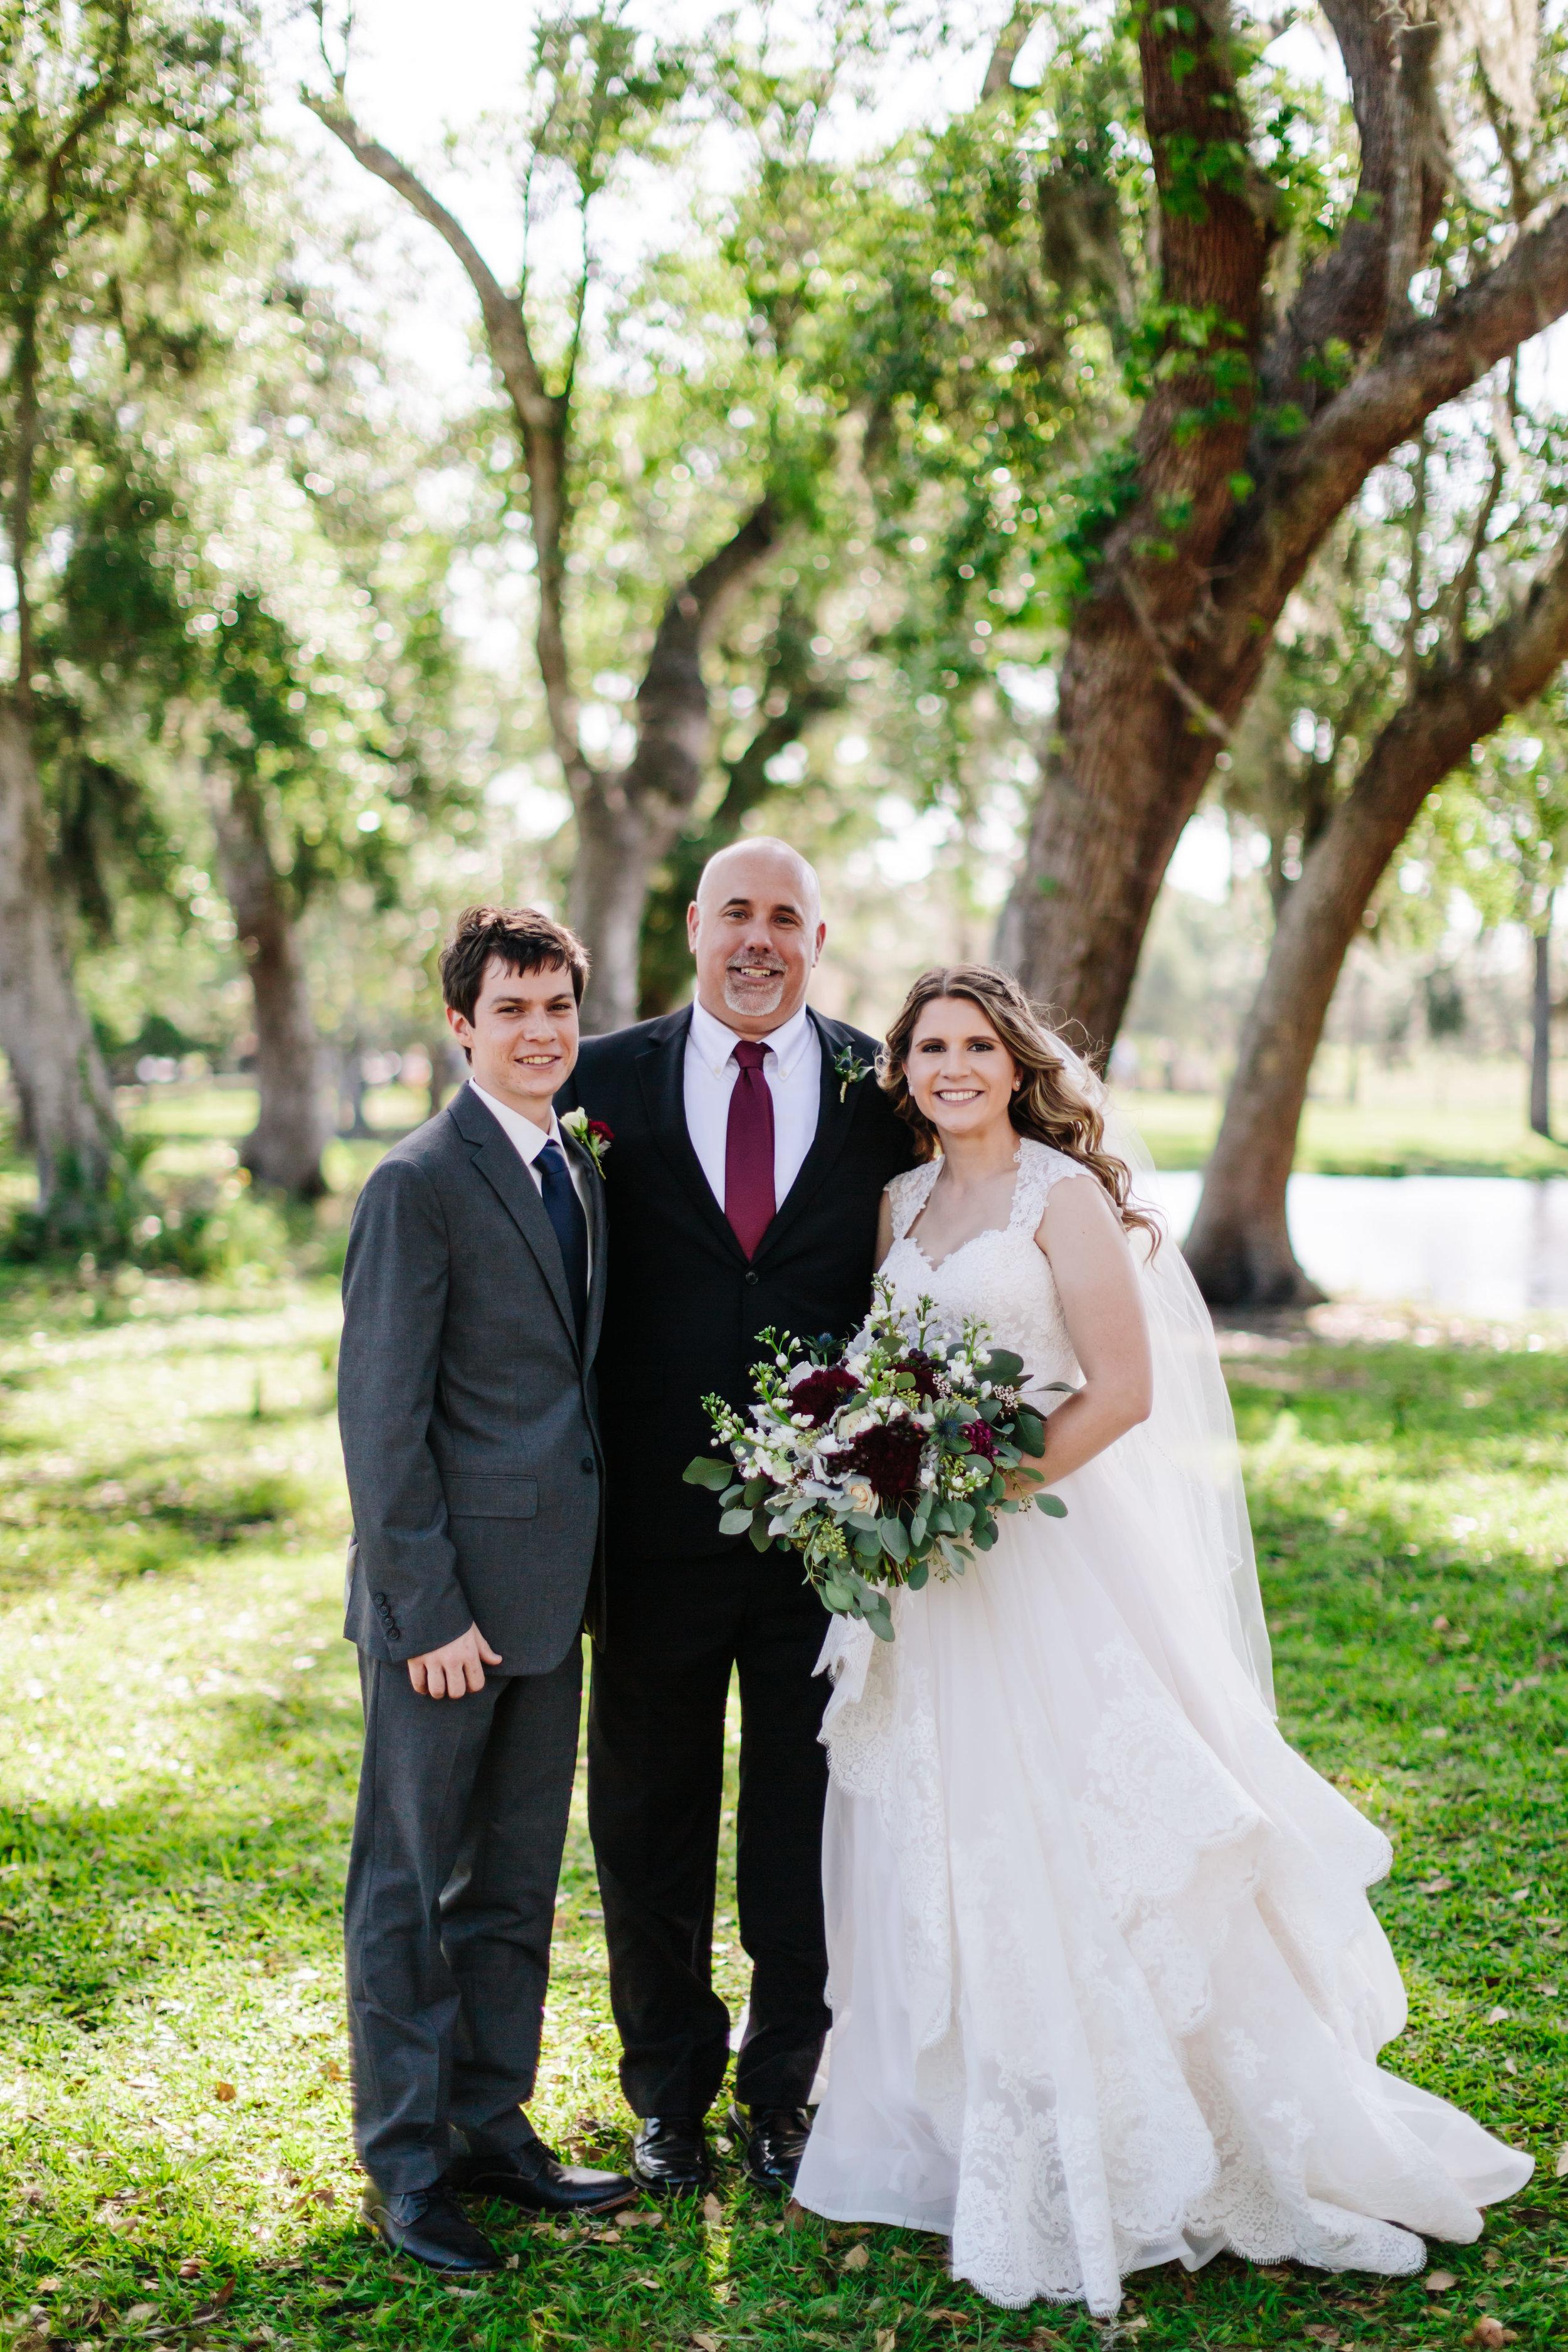 2018.04.14 Zak and Jamisyn Unrue Black Willow Barn Wedding Finals-486.jpg